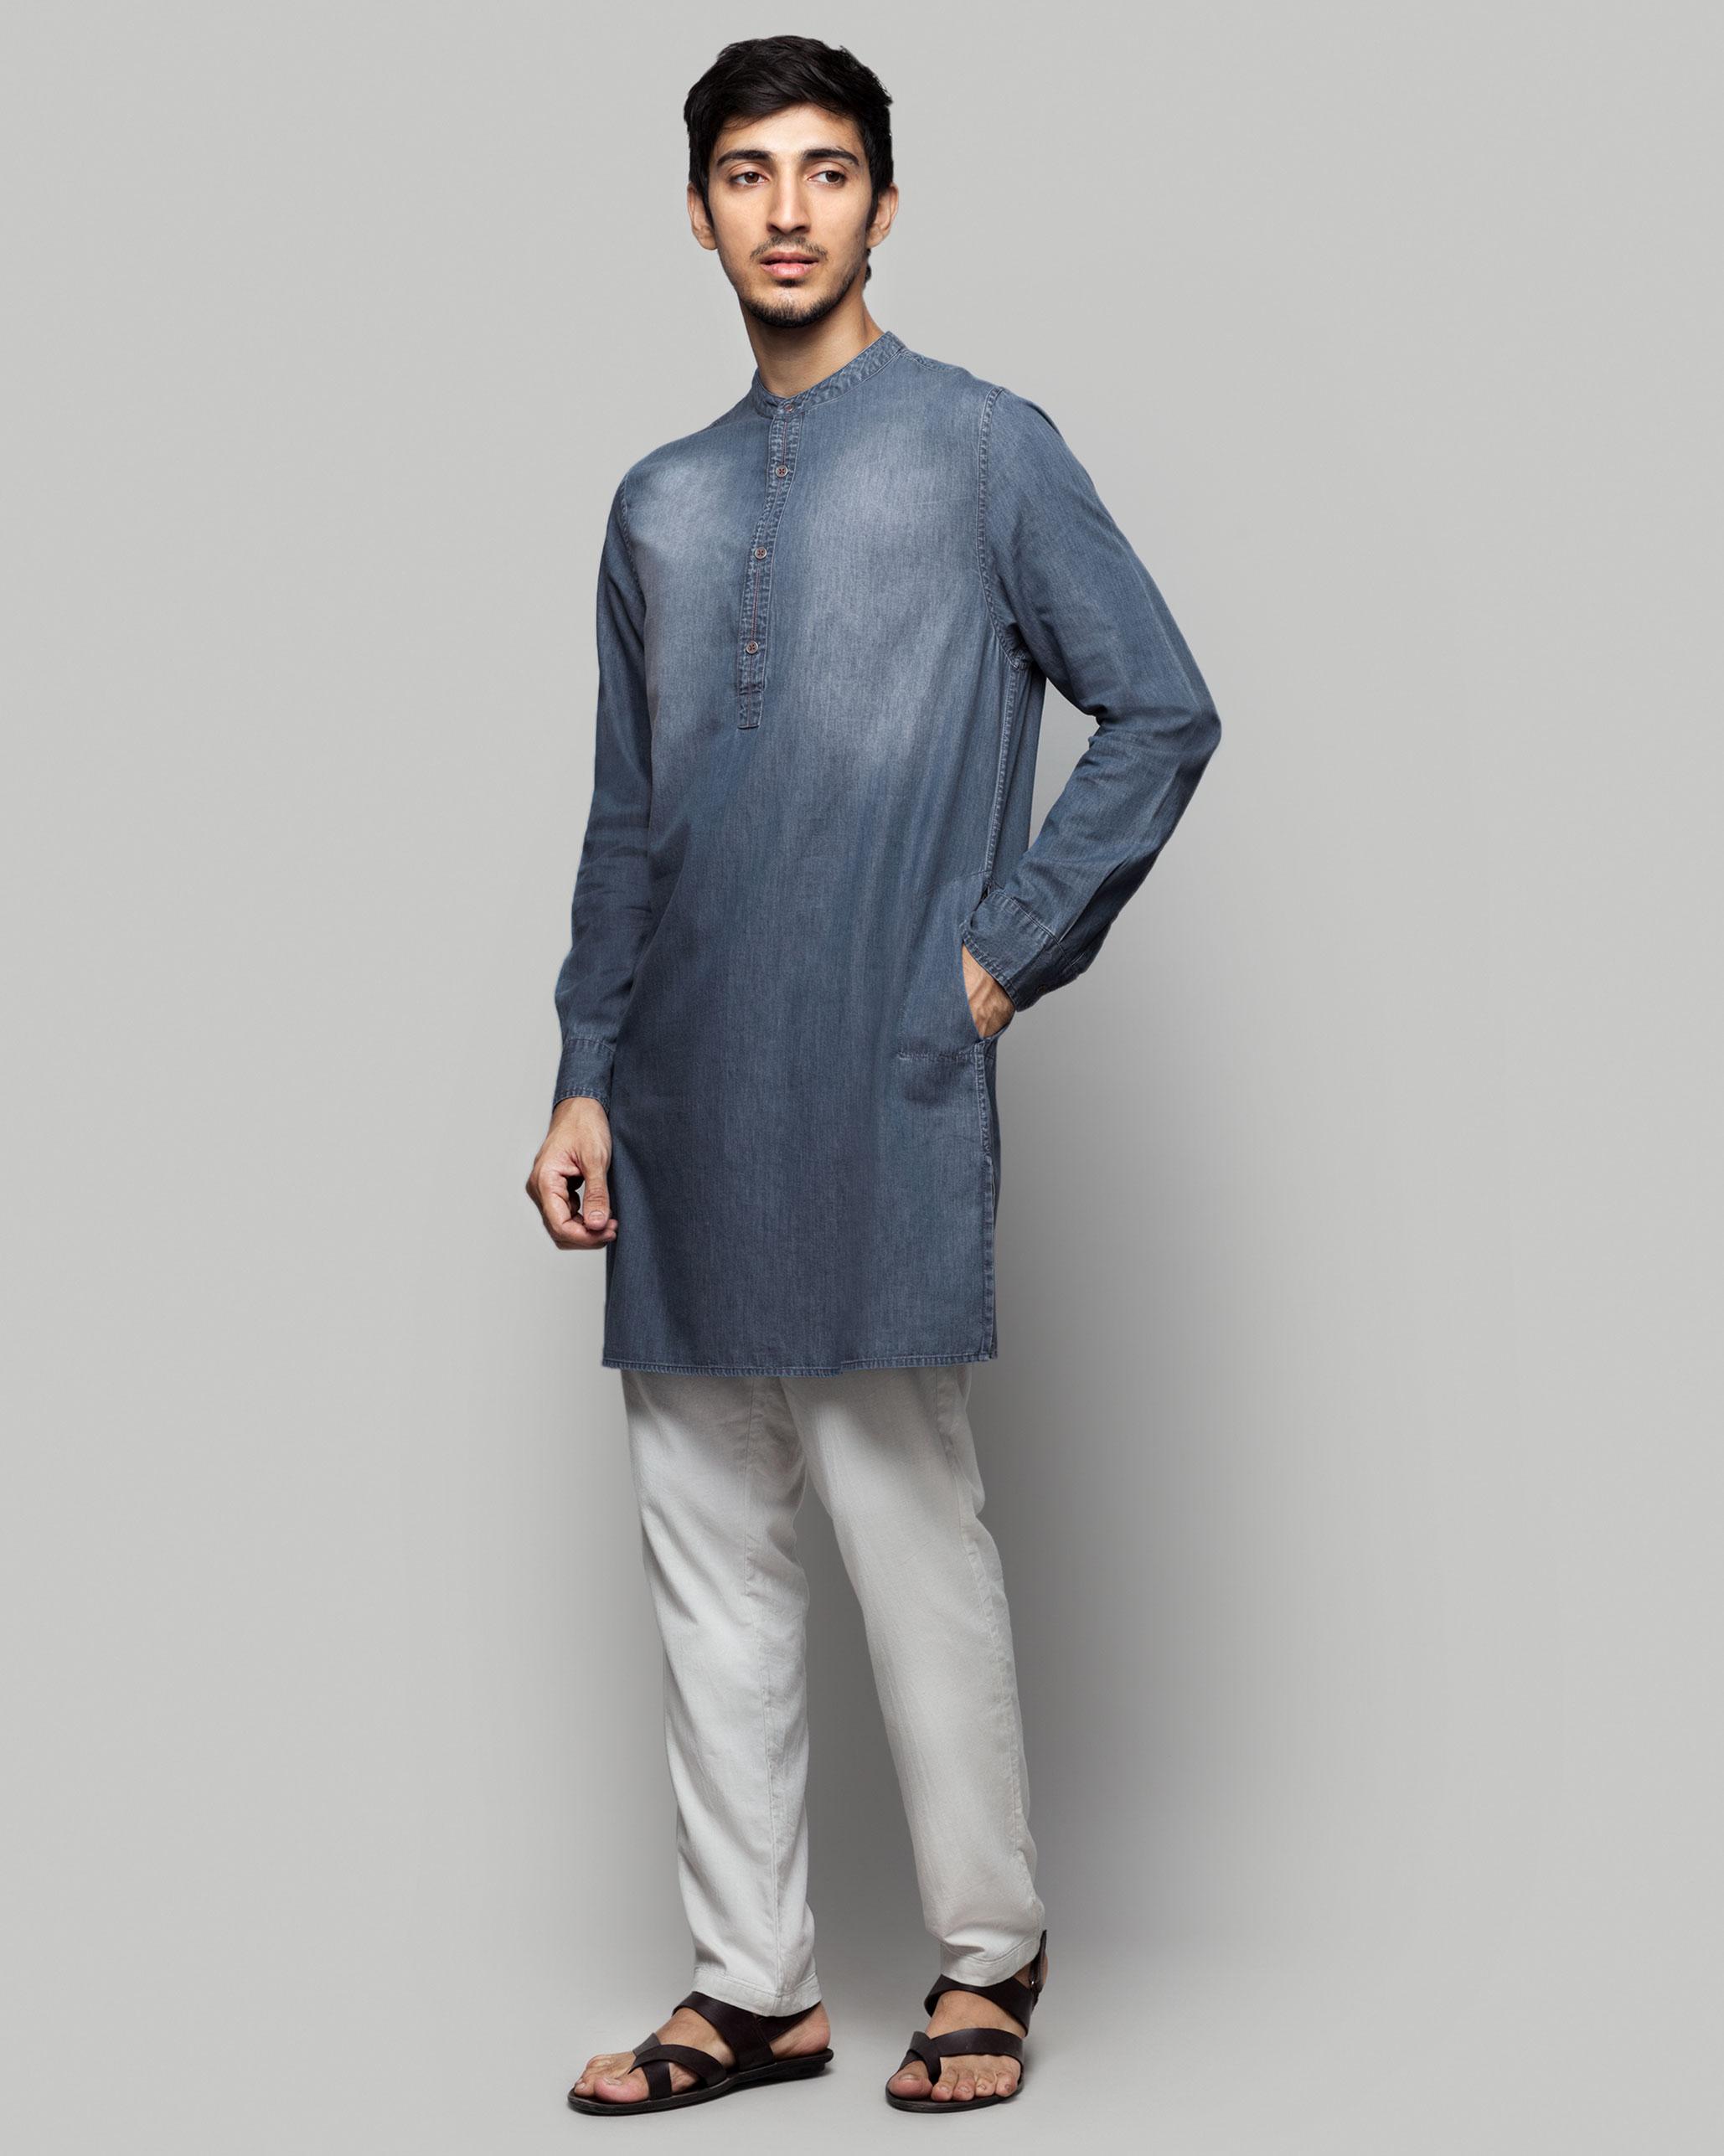 0f8ecf1e5b Chandni Chowk Denim Kurta from Men collection at Nicobar